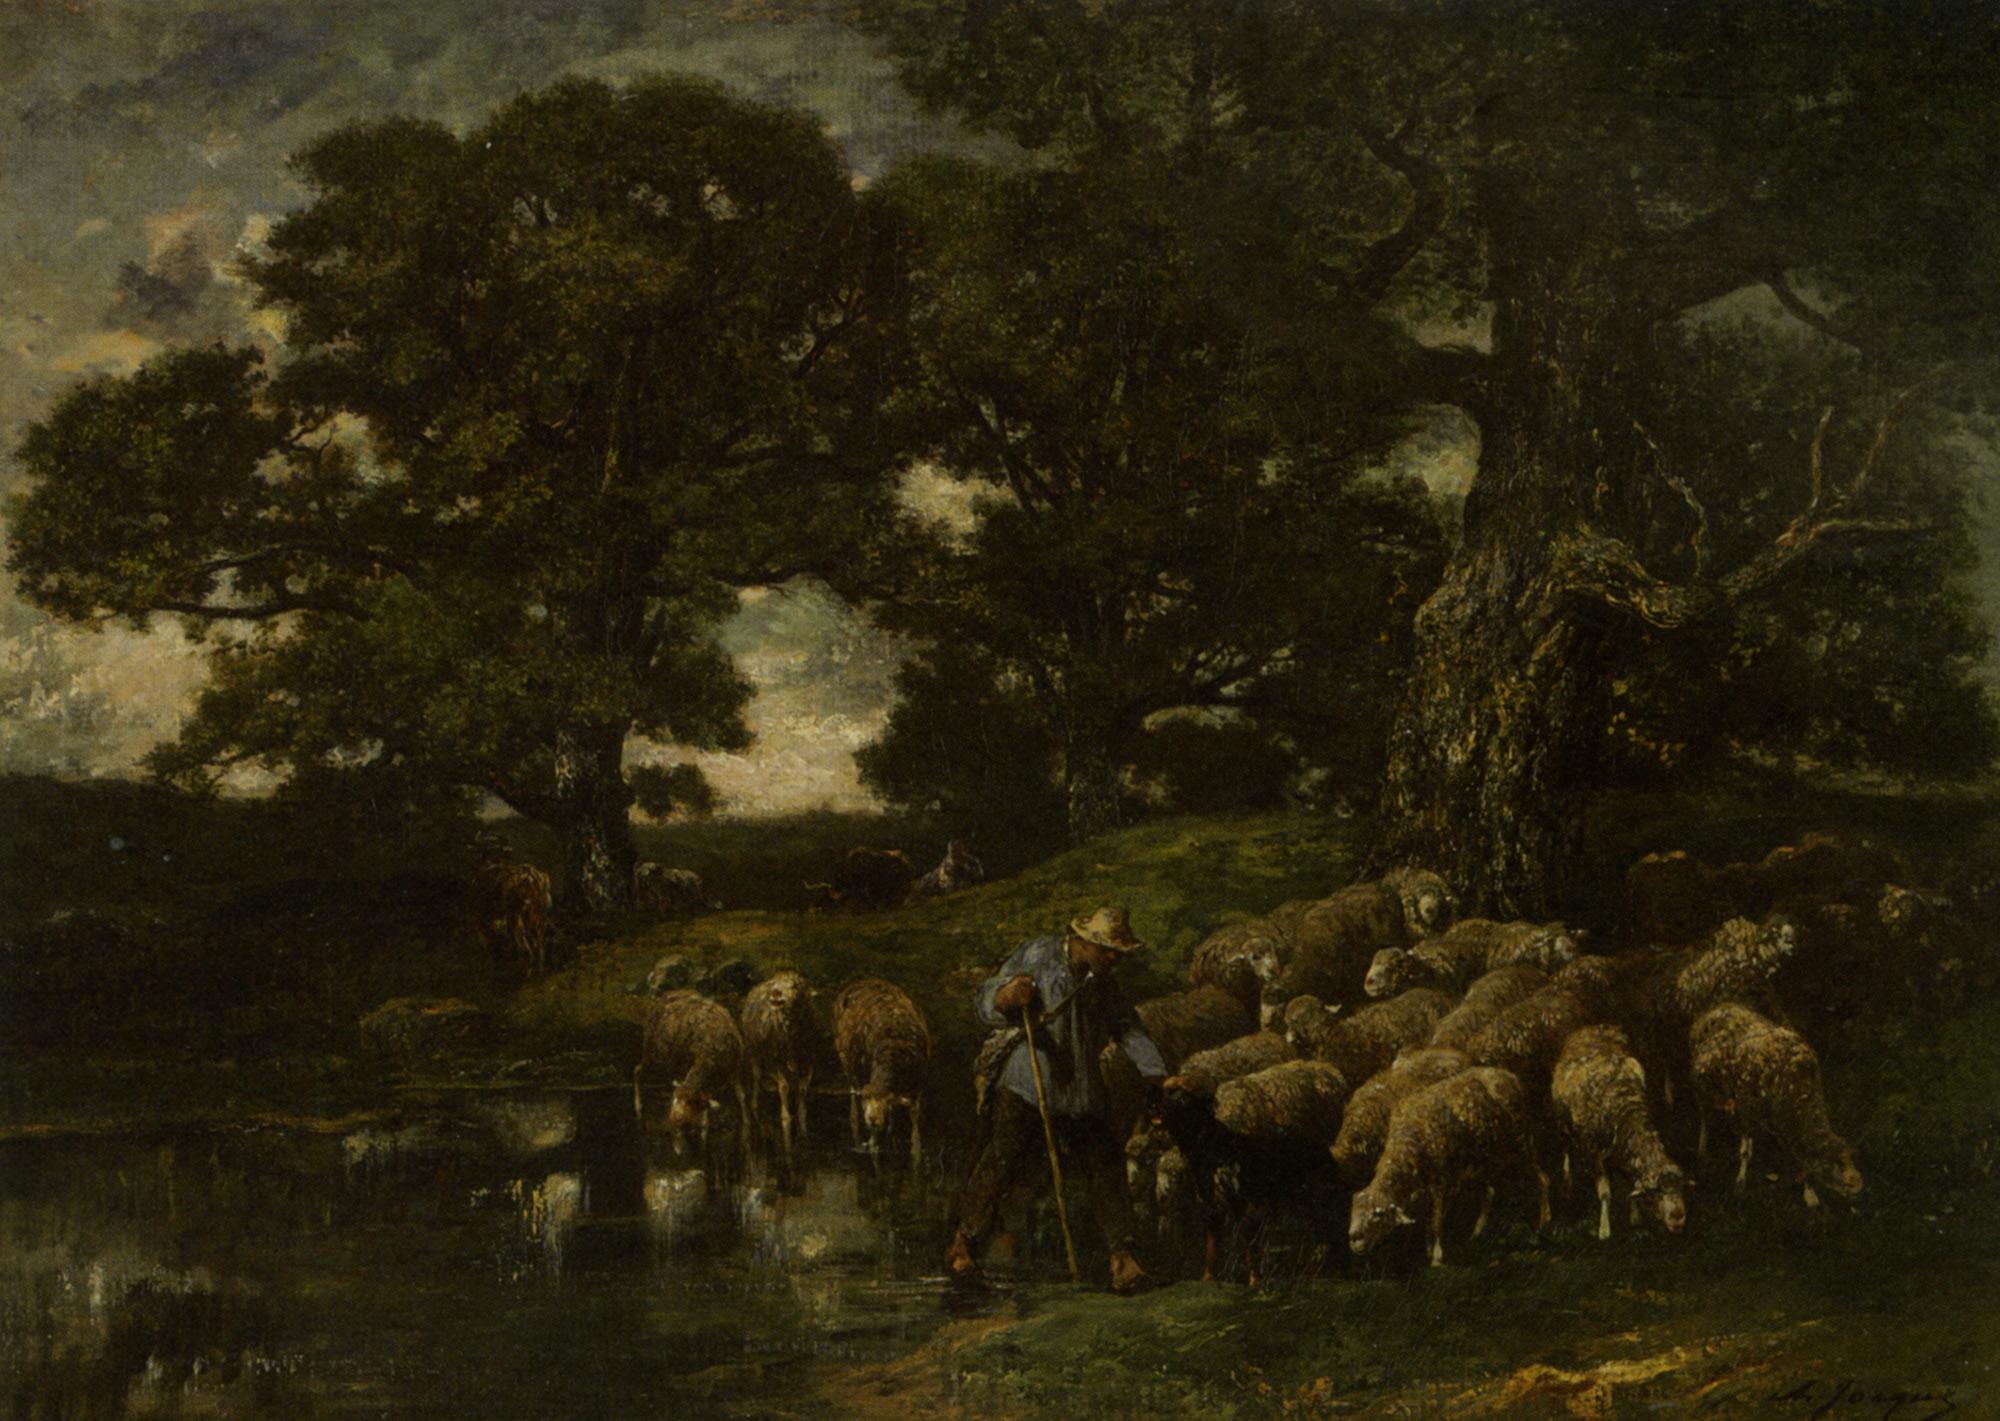 A Shepherd and his Flock by a Pond :: Charles Emile Jacque - Village life ôîòî